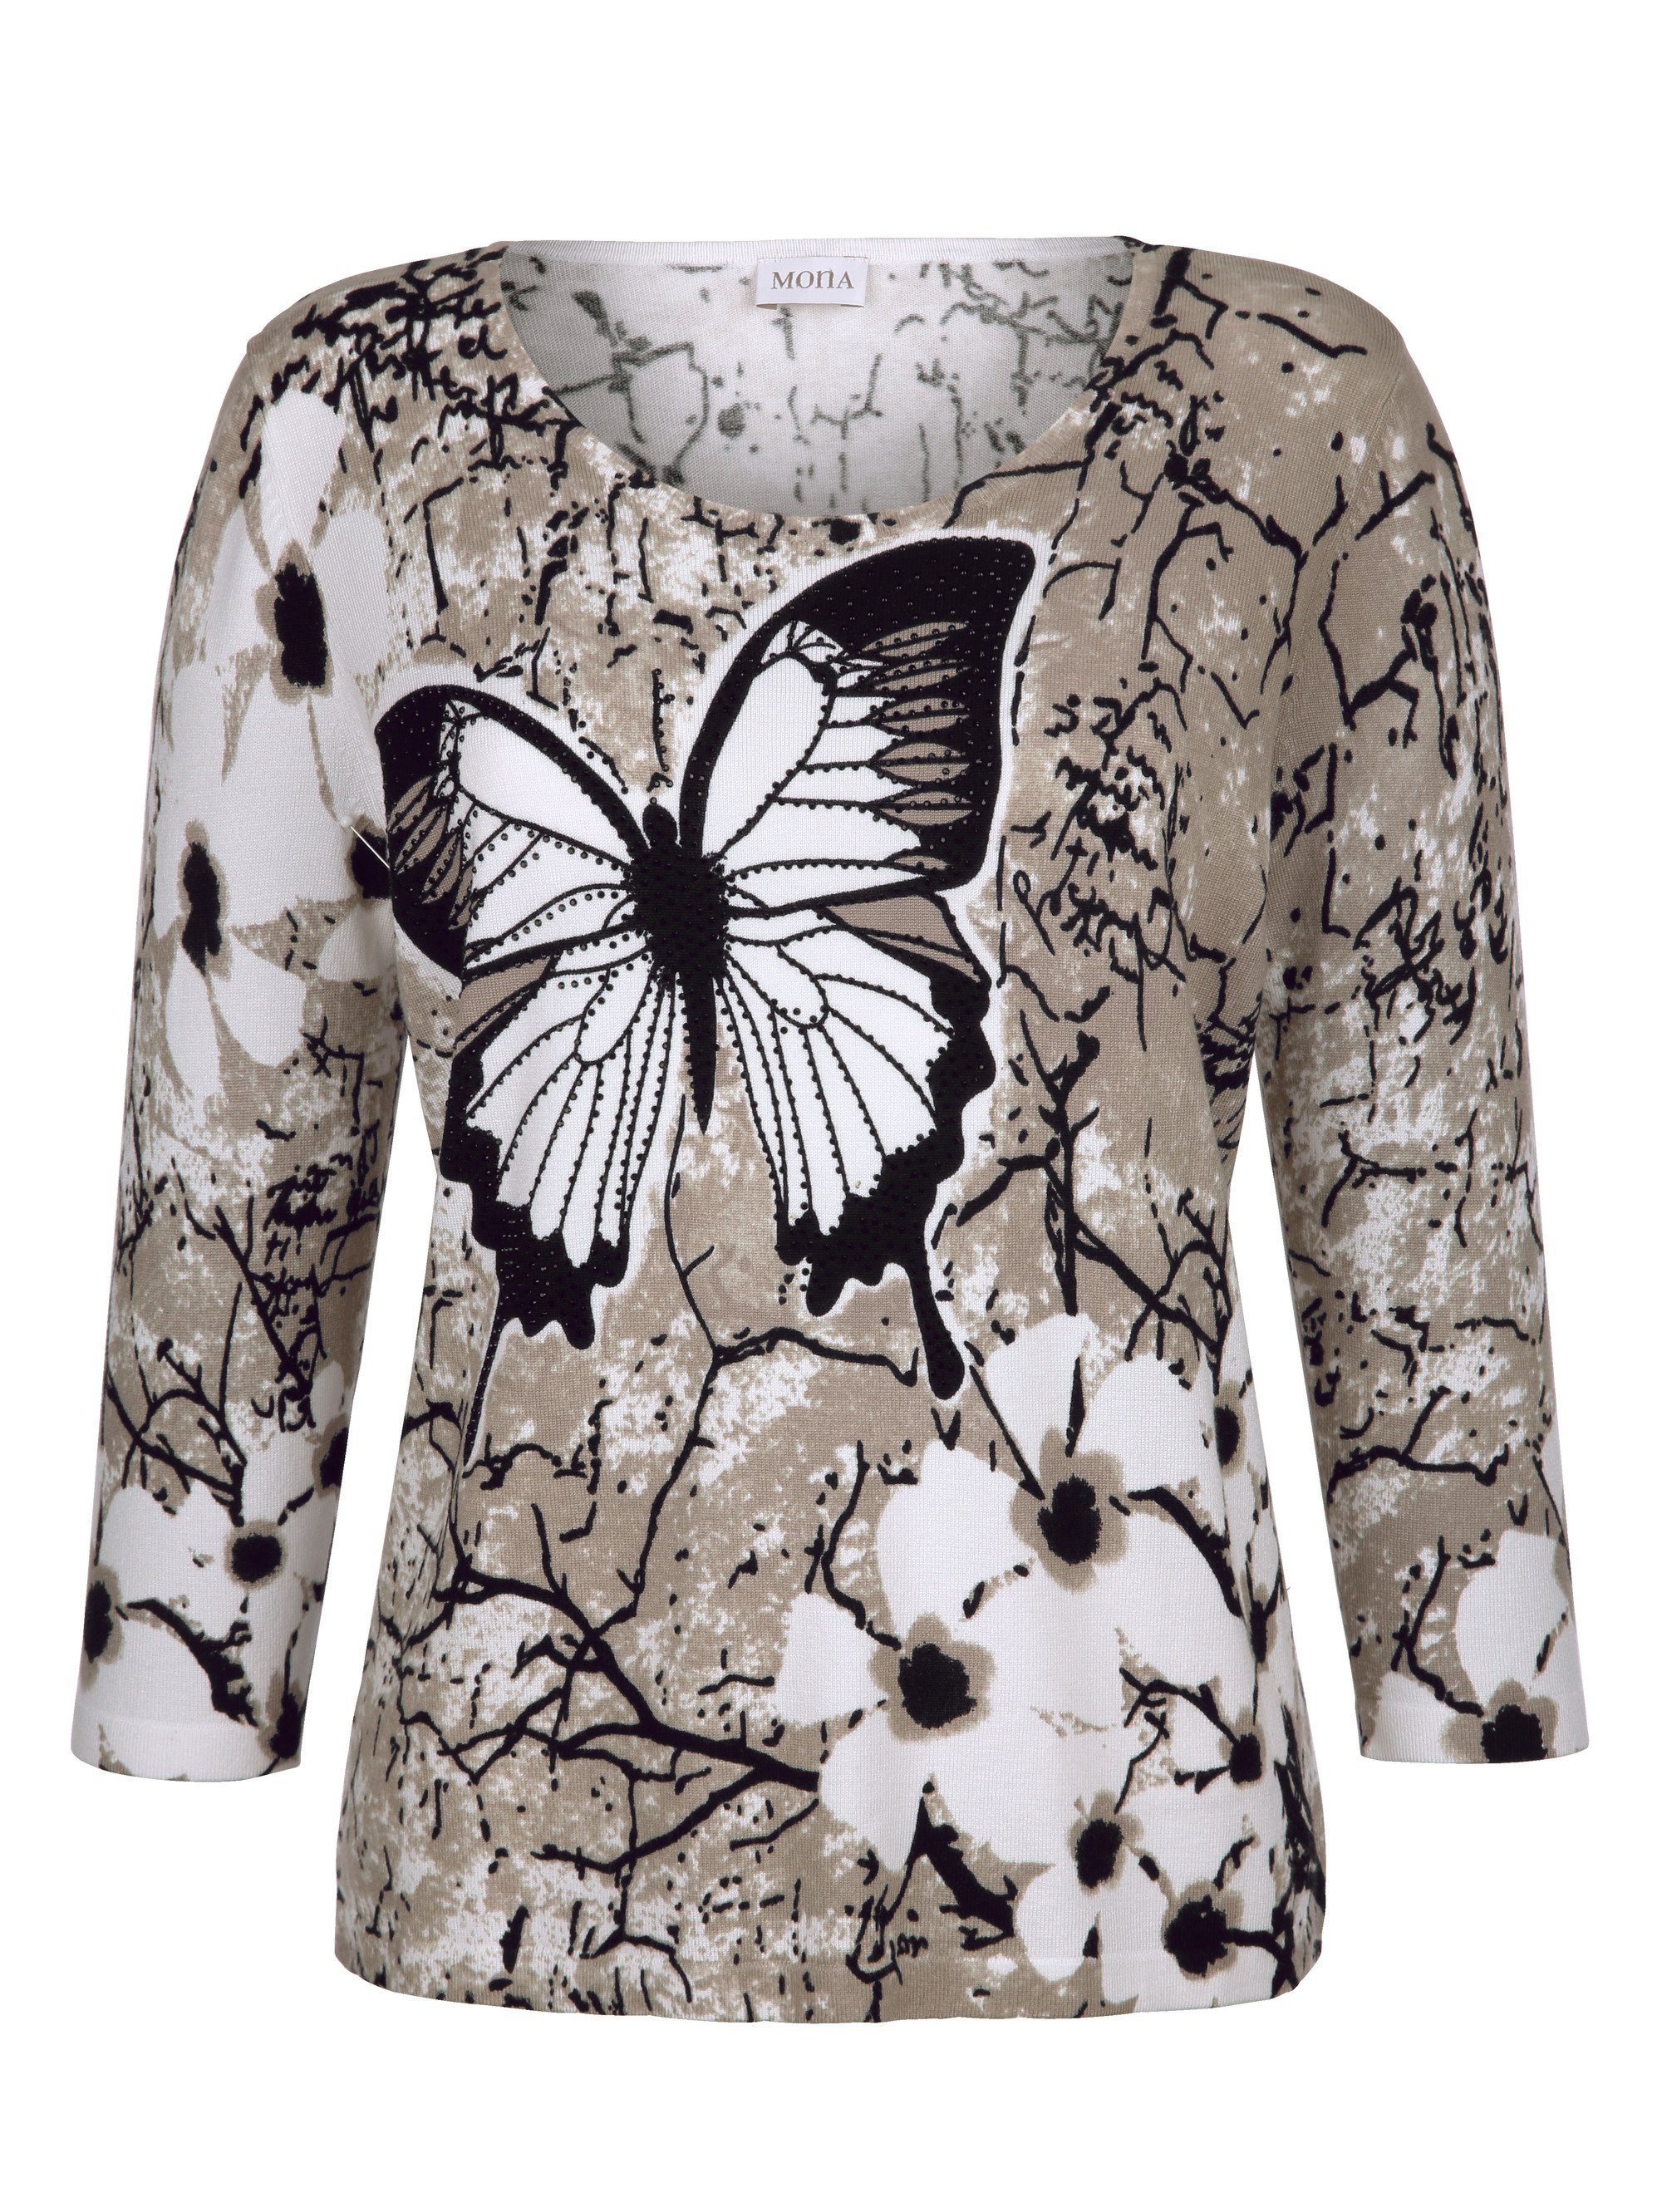 Platziertem Pullover Mona Schmetterlingsdruck Pullover Mona Mit Mit Schmetterlingsdruck Mona Platziertem 54ARL3jq